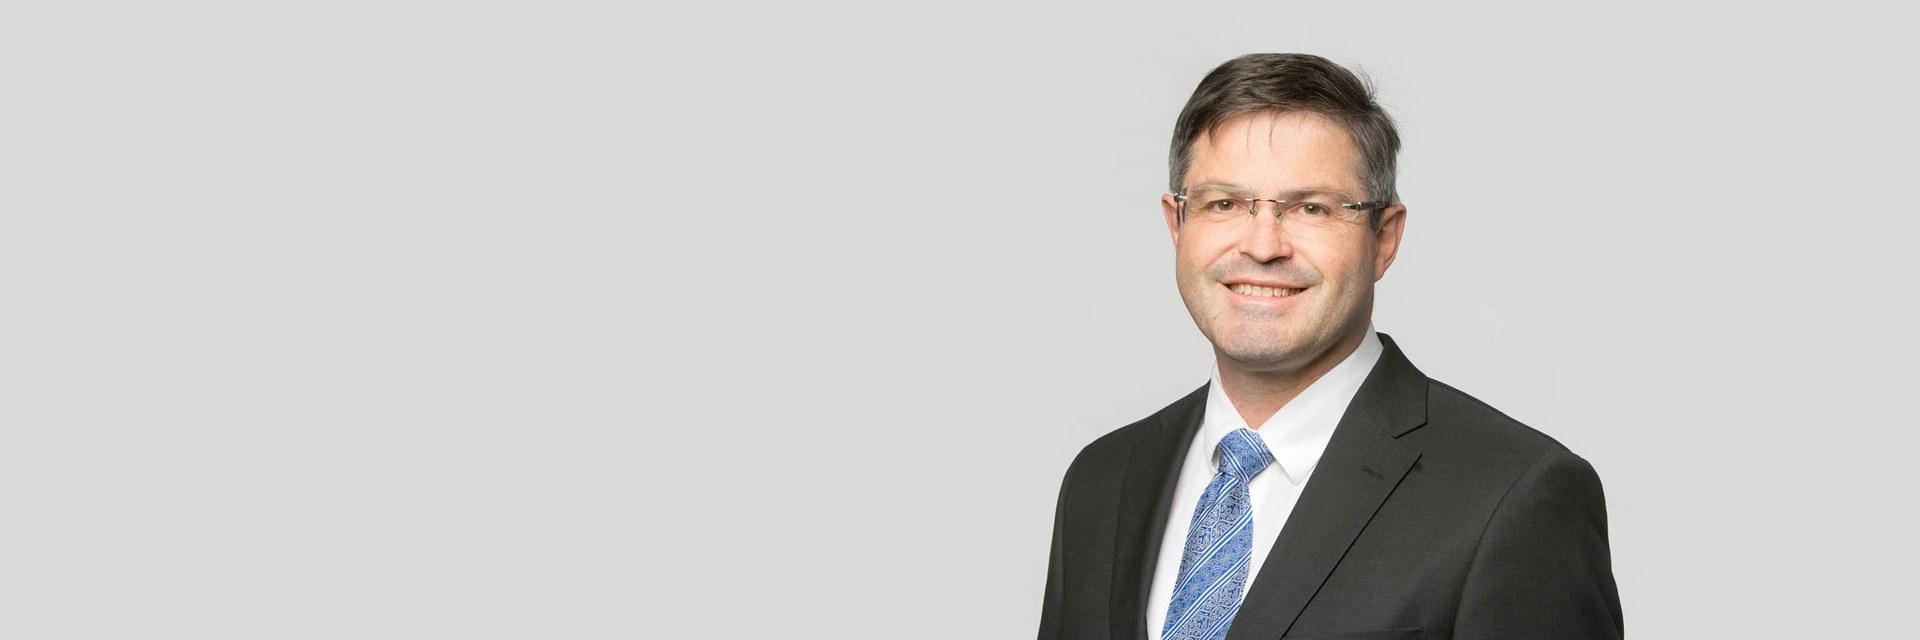 Prof. Dr. Markus Freiburghaus